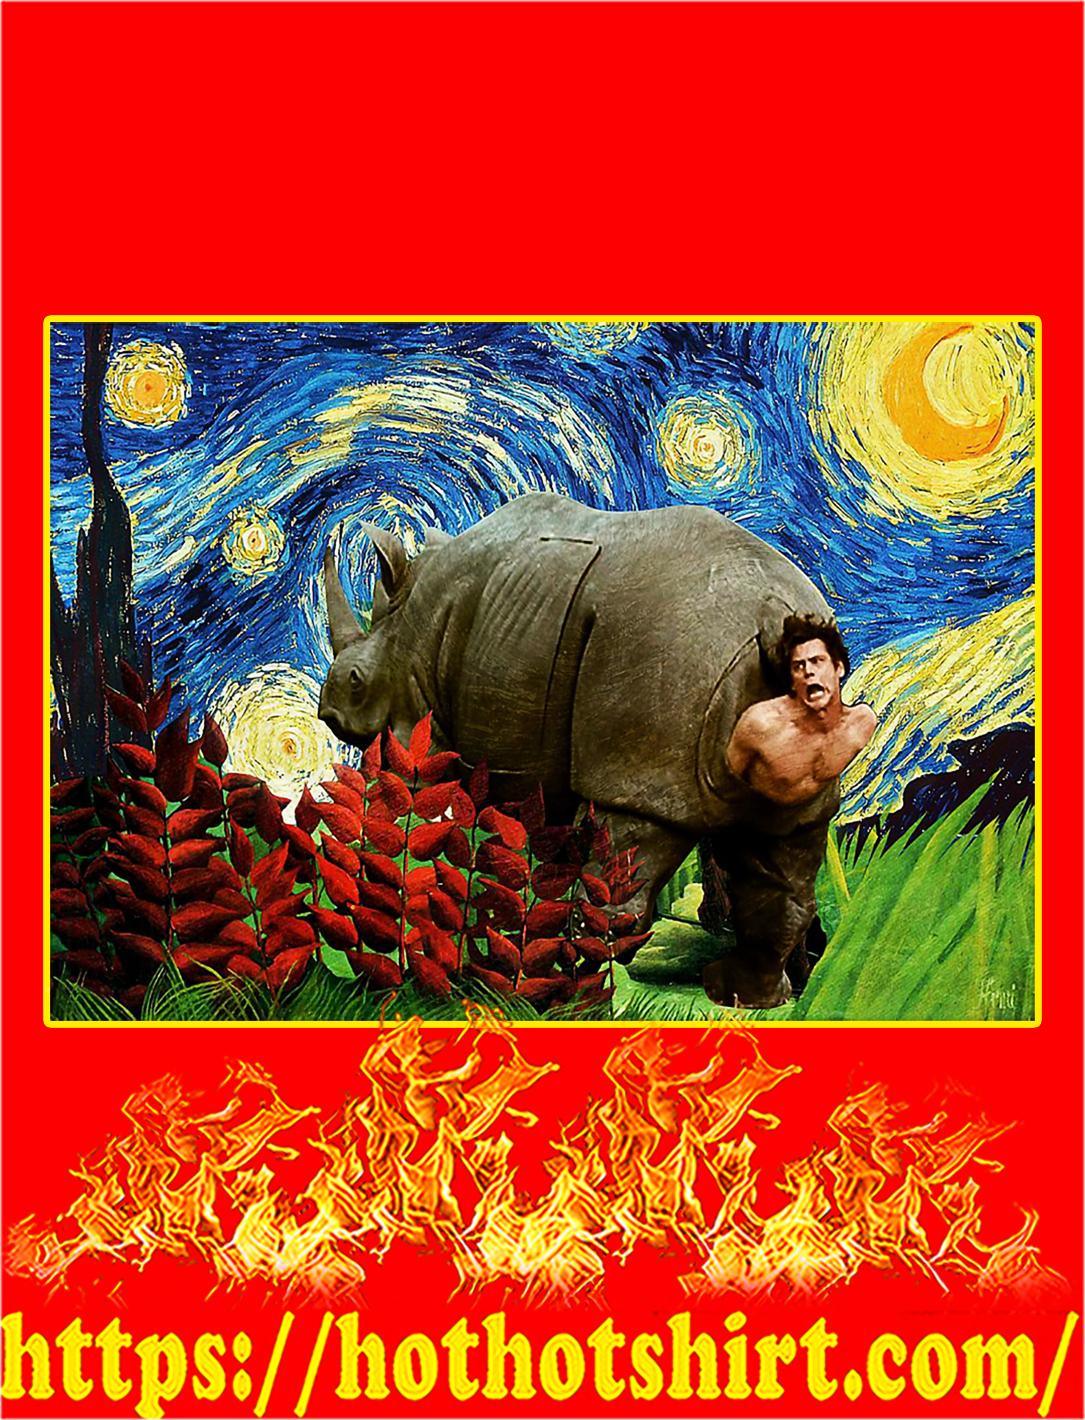 Rhino scene ace ventura starry night van gogh poster - A2